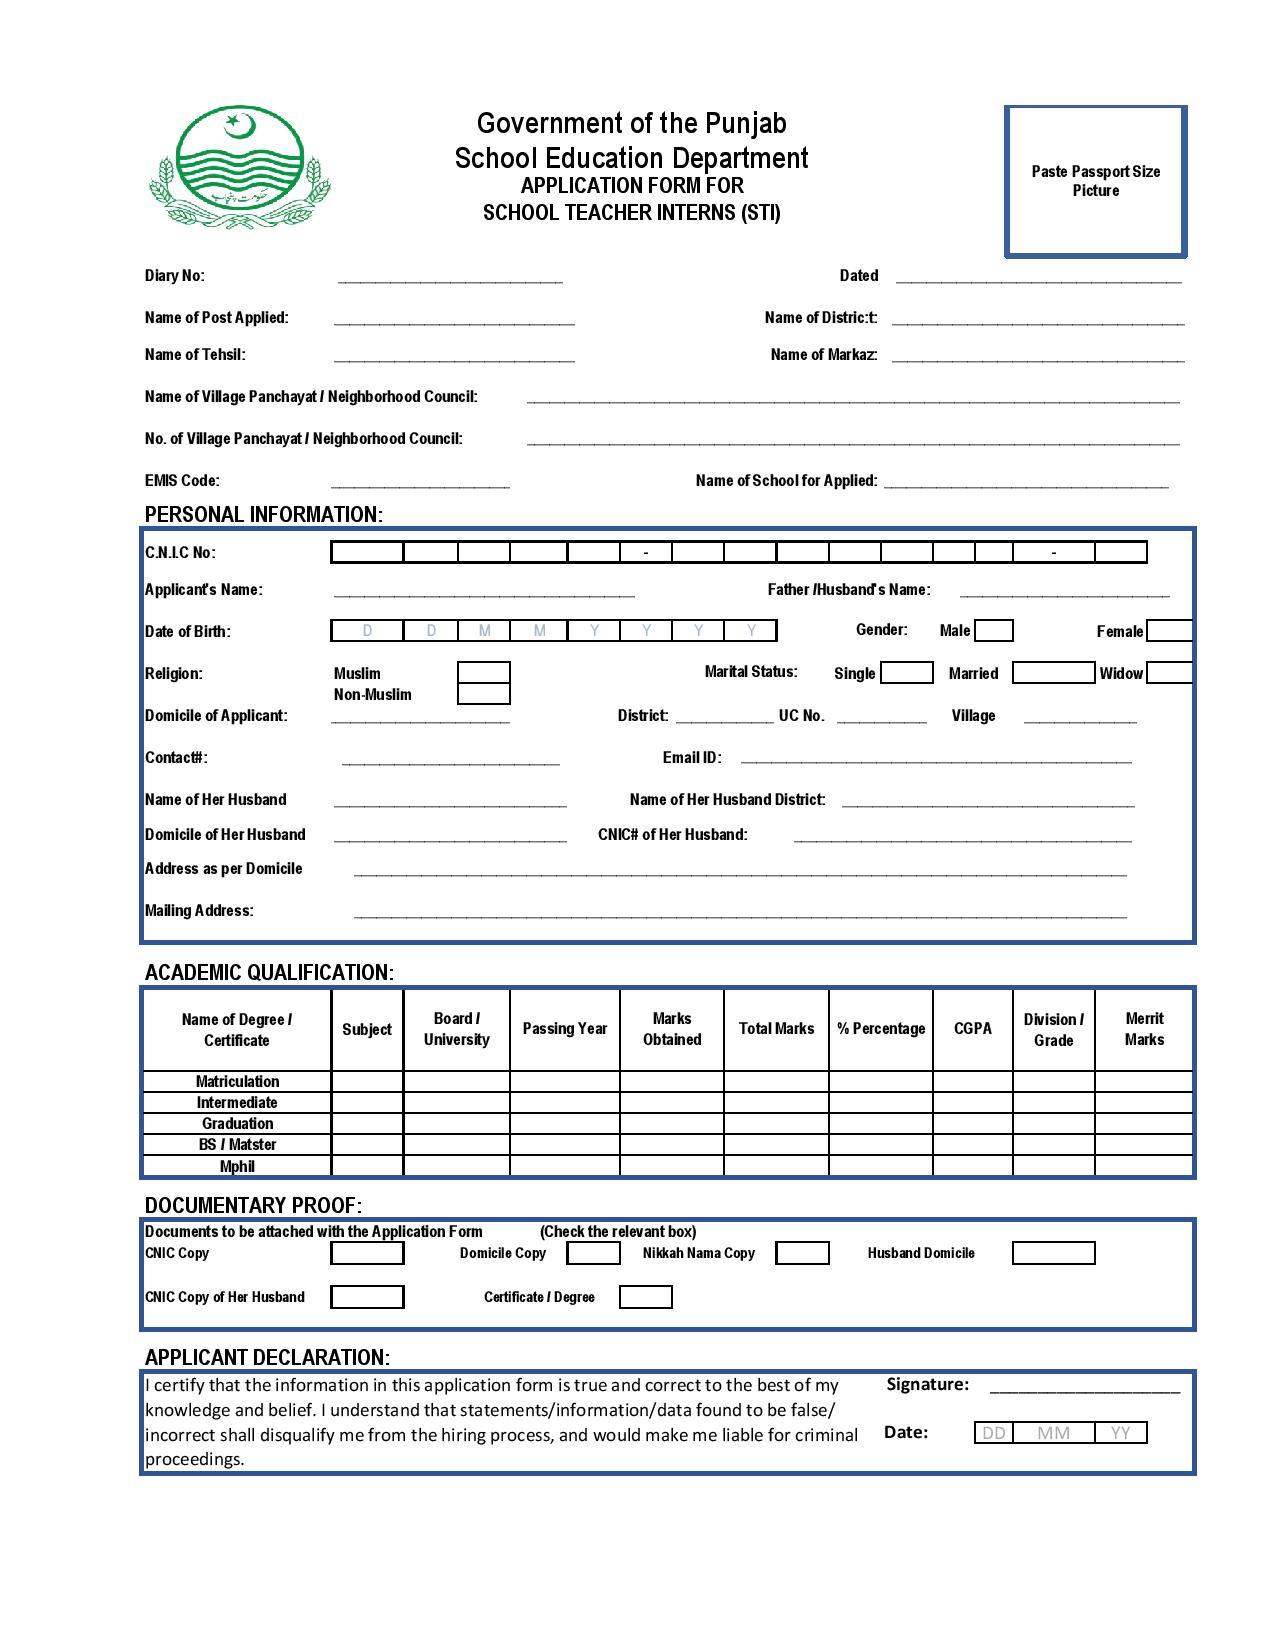 STI jobs 2021 Application Form